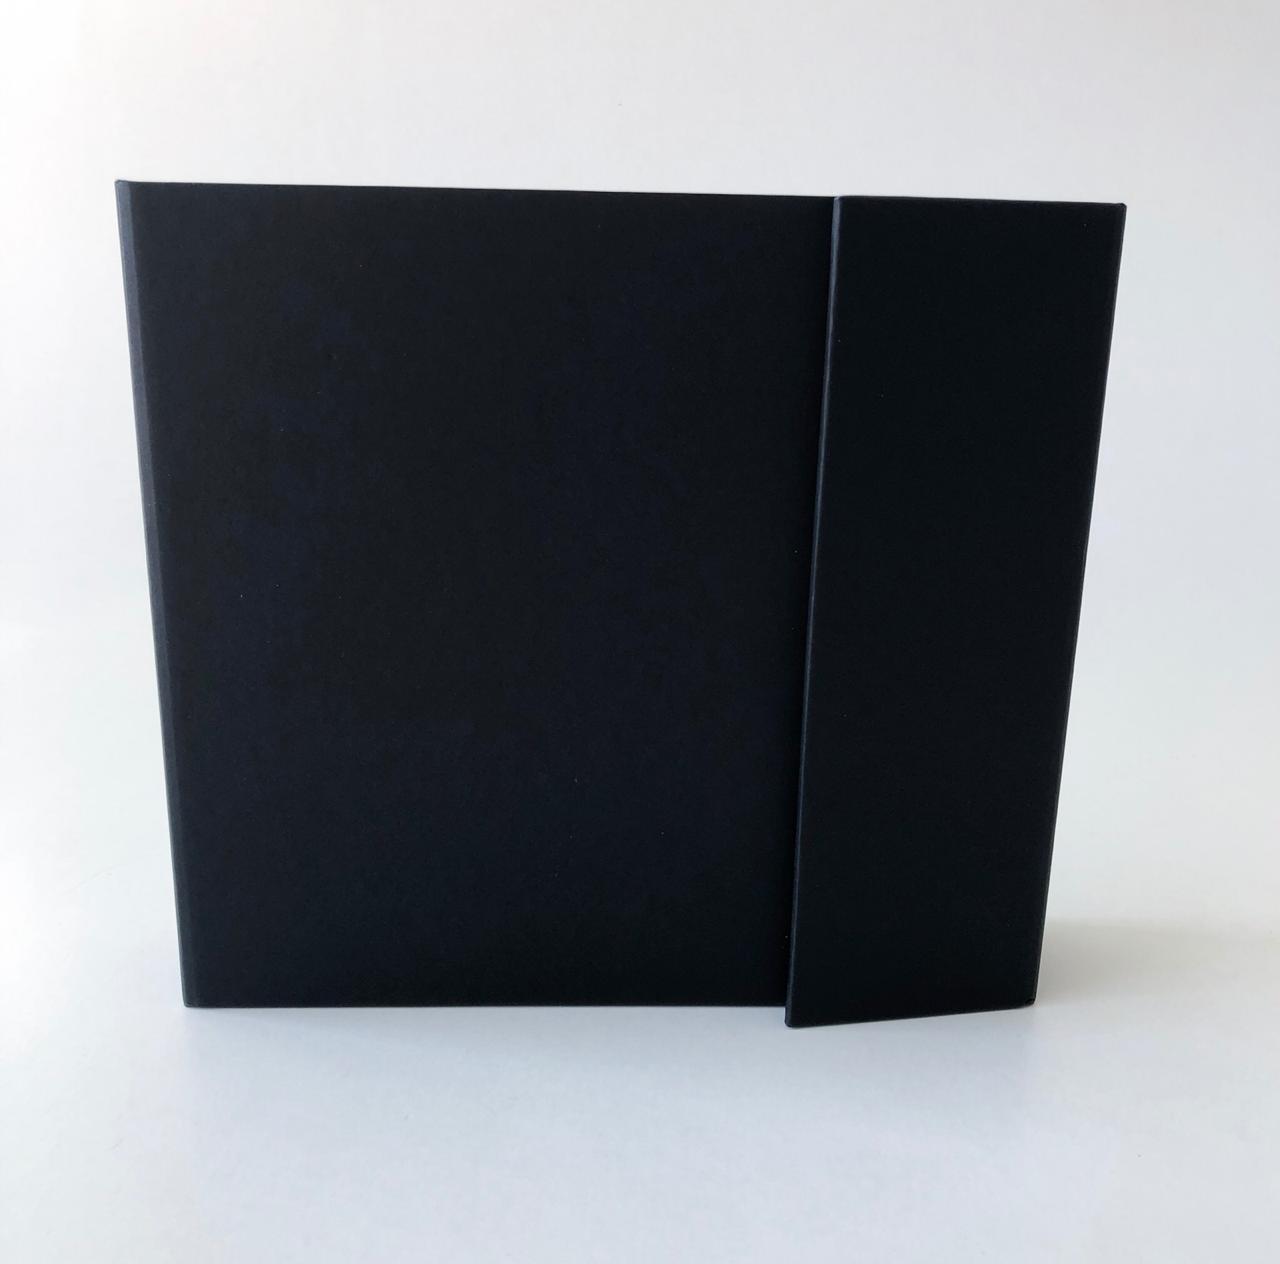 Álbum com Caixa Preto - JuJu Scrapbook  - JuJu Scrapbook